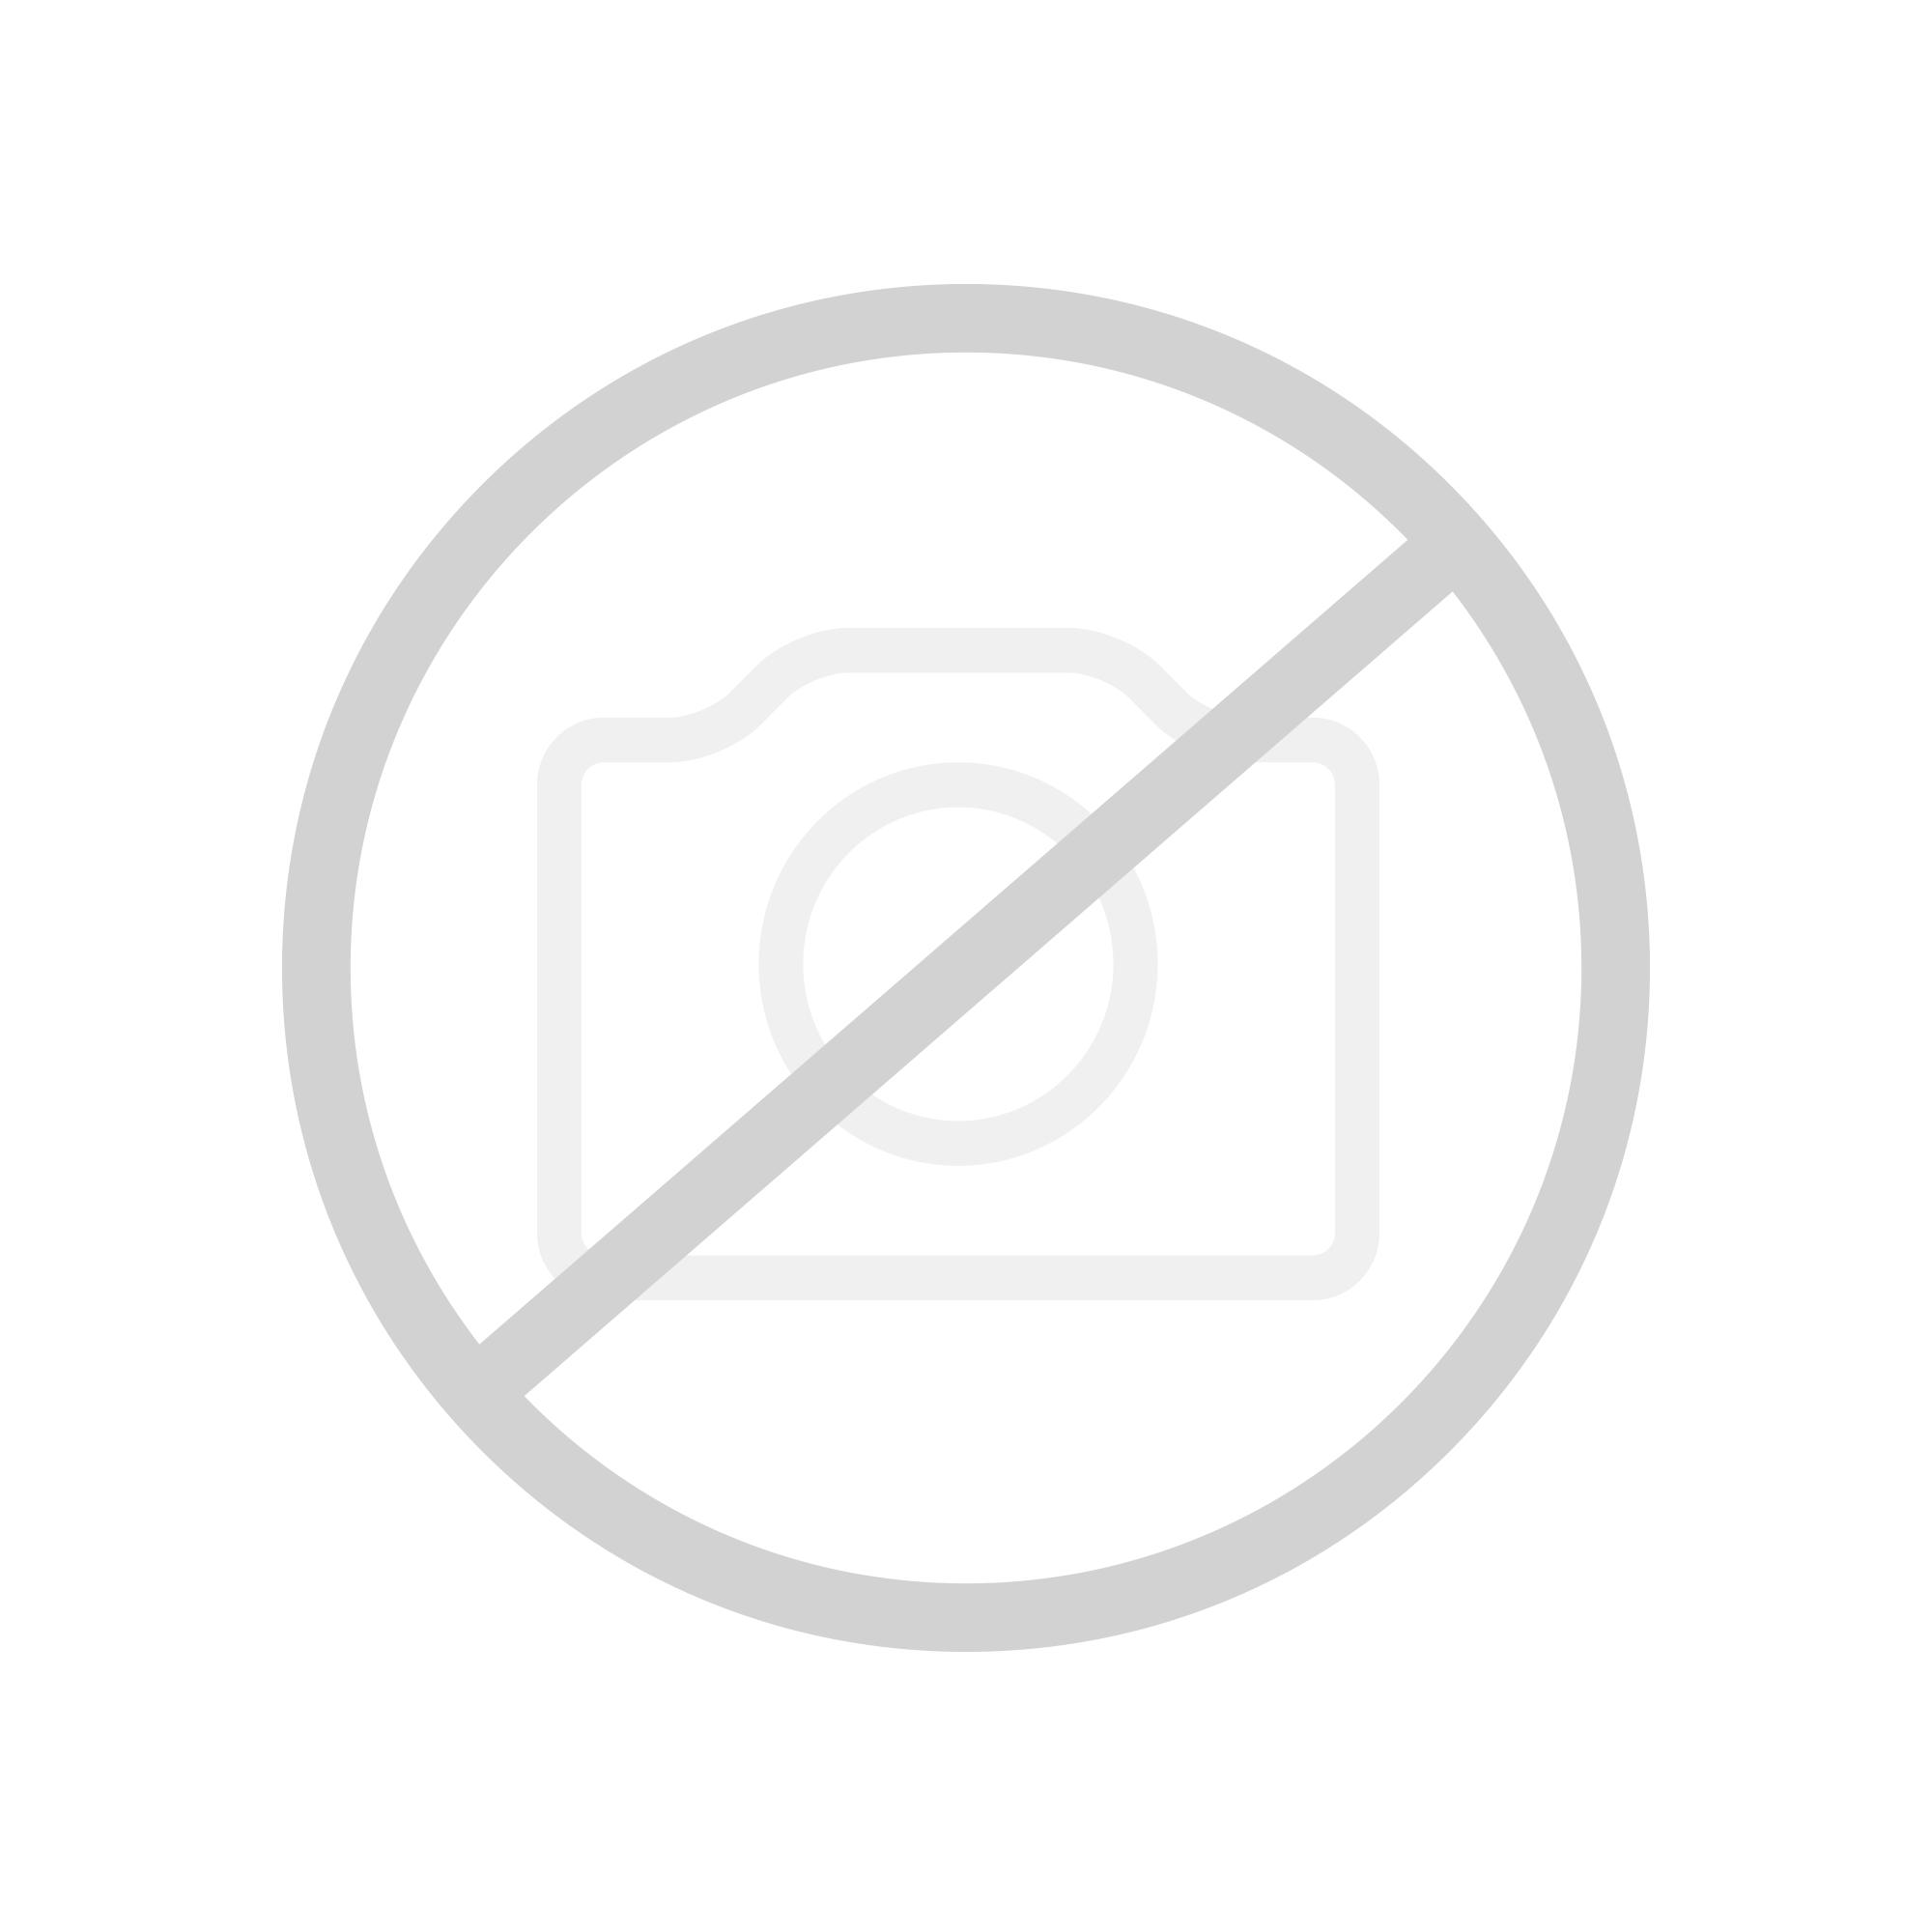 Tellkamp Solitär Fix Oval Badewanne